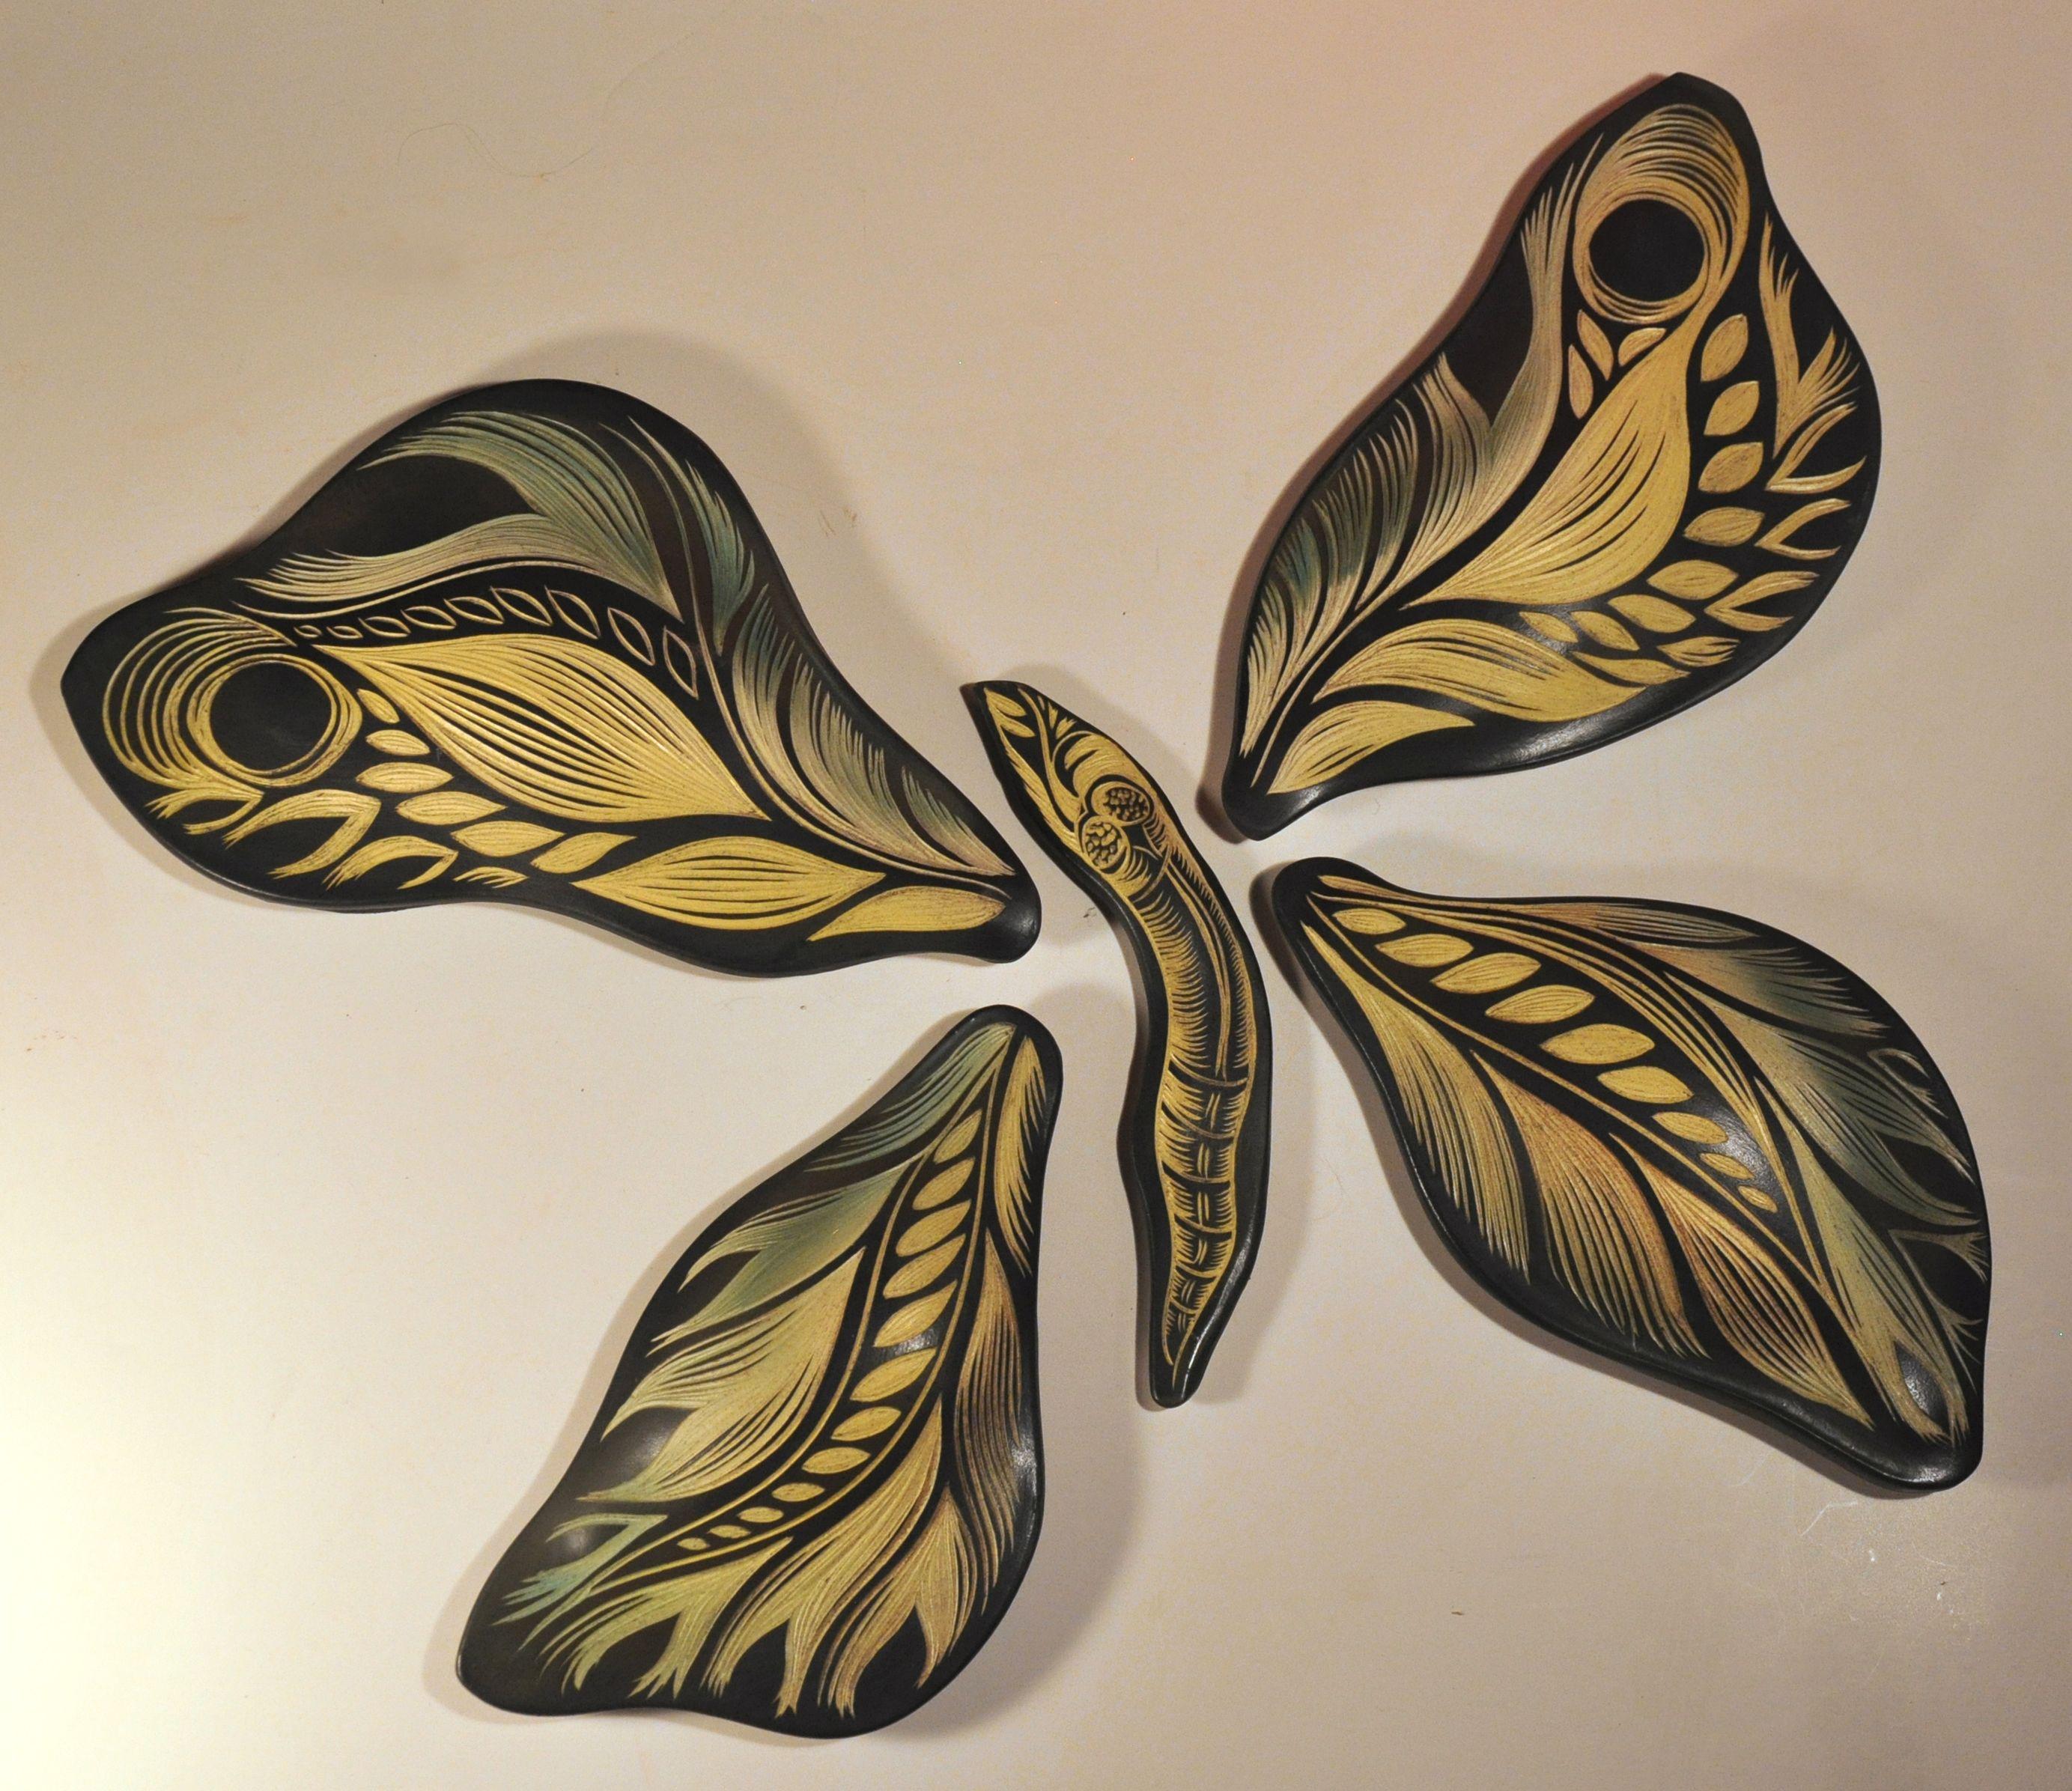 Natalie blake studios handmade ceramic wall art tile ceramic natalie blake studios handmade ceramic wall art tile dailygadgetfo Gallery